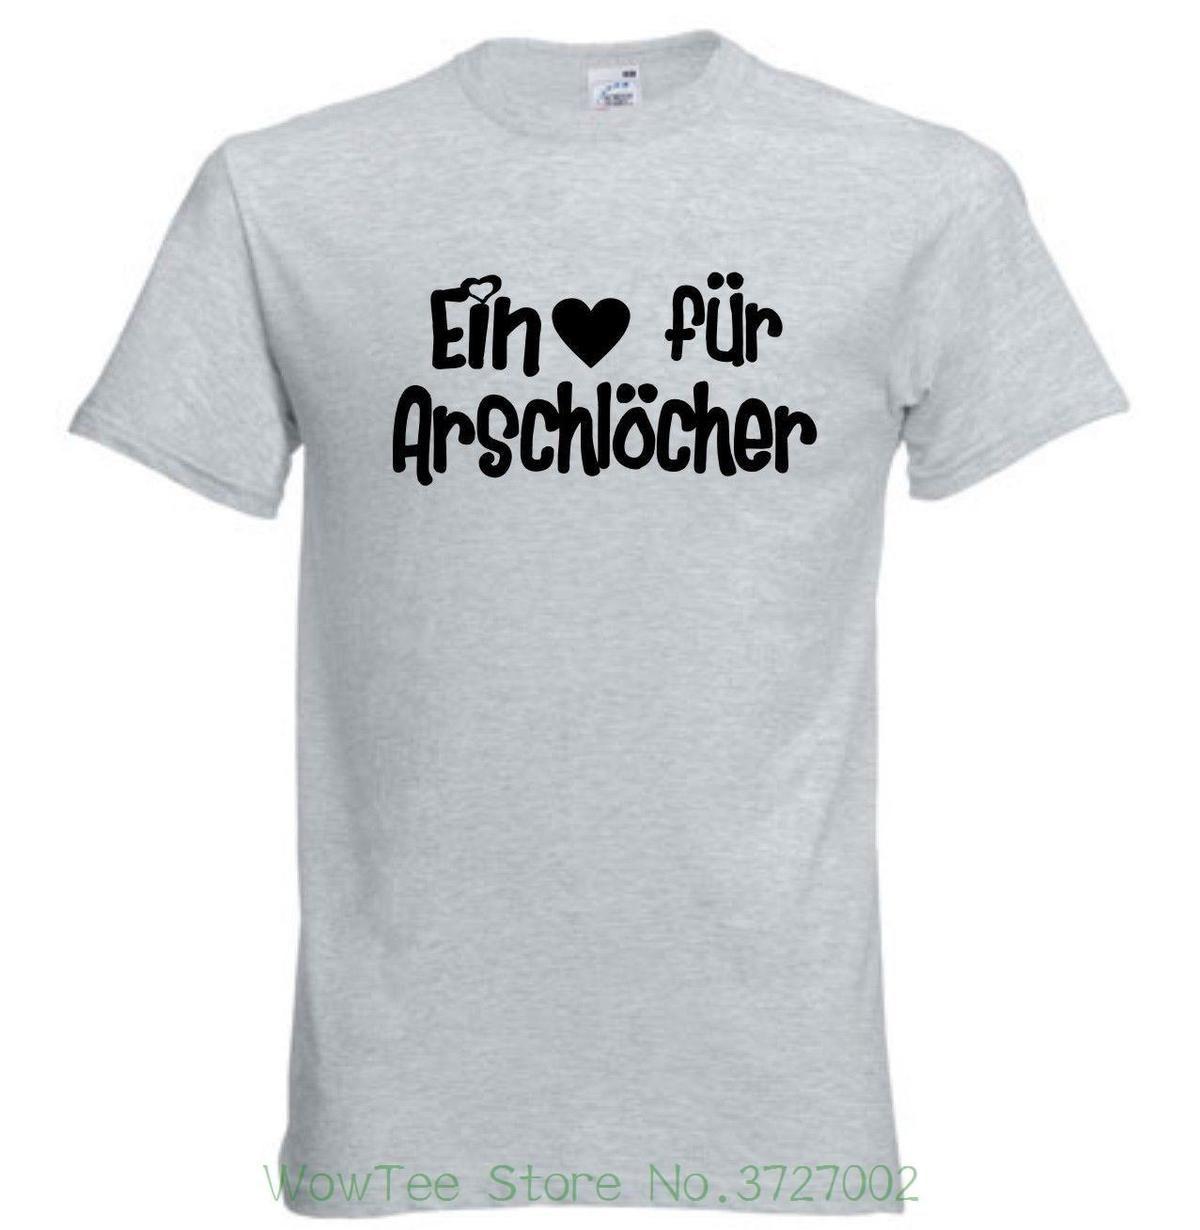 1ad280f9230372 Graues T Shirt Mit Spruch Ein Herz Fur Arschl ? Cher Fun Party Dk029  Printed T Shirt Boys Top Tee Shirt Cotton Tea Shirt Vintage Tee Shirts From  Linnan0007, ...